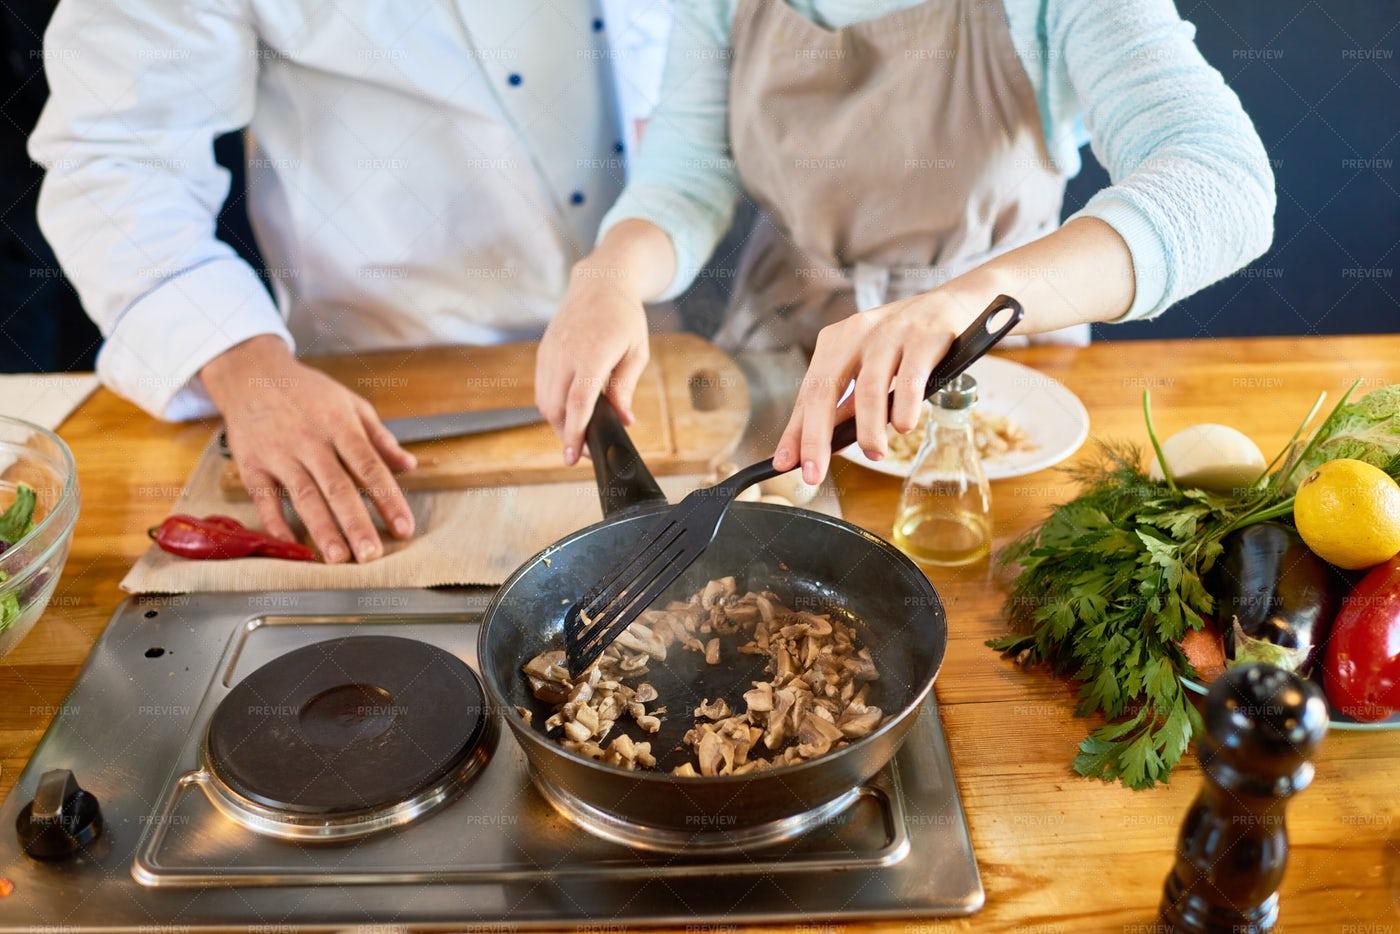 Frying Mushrooms At Cooking...: Stock Photos